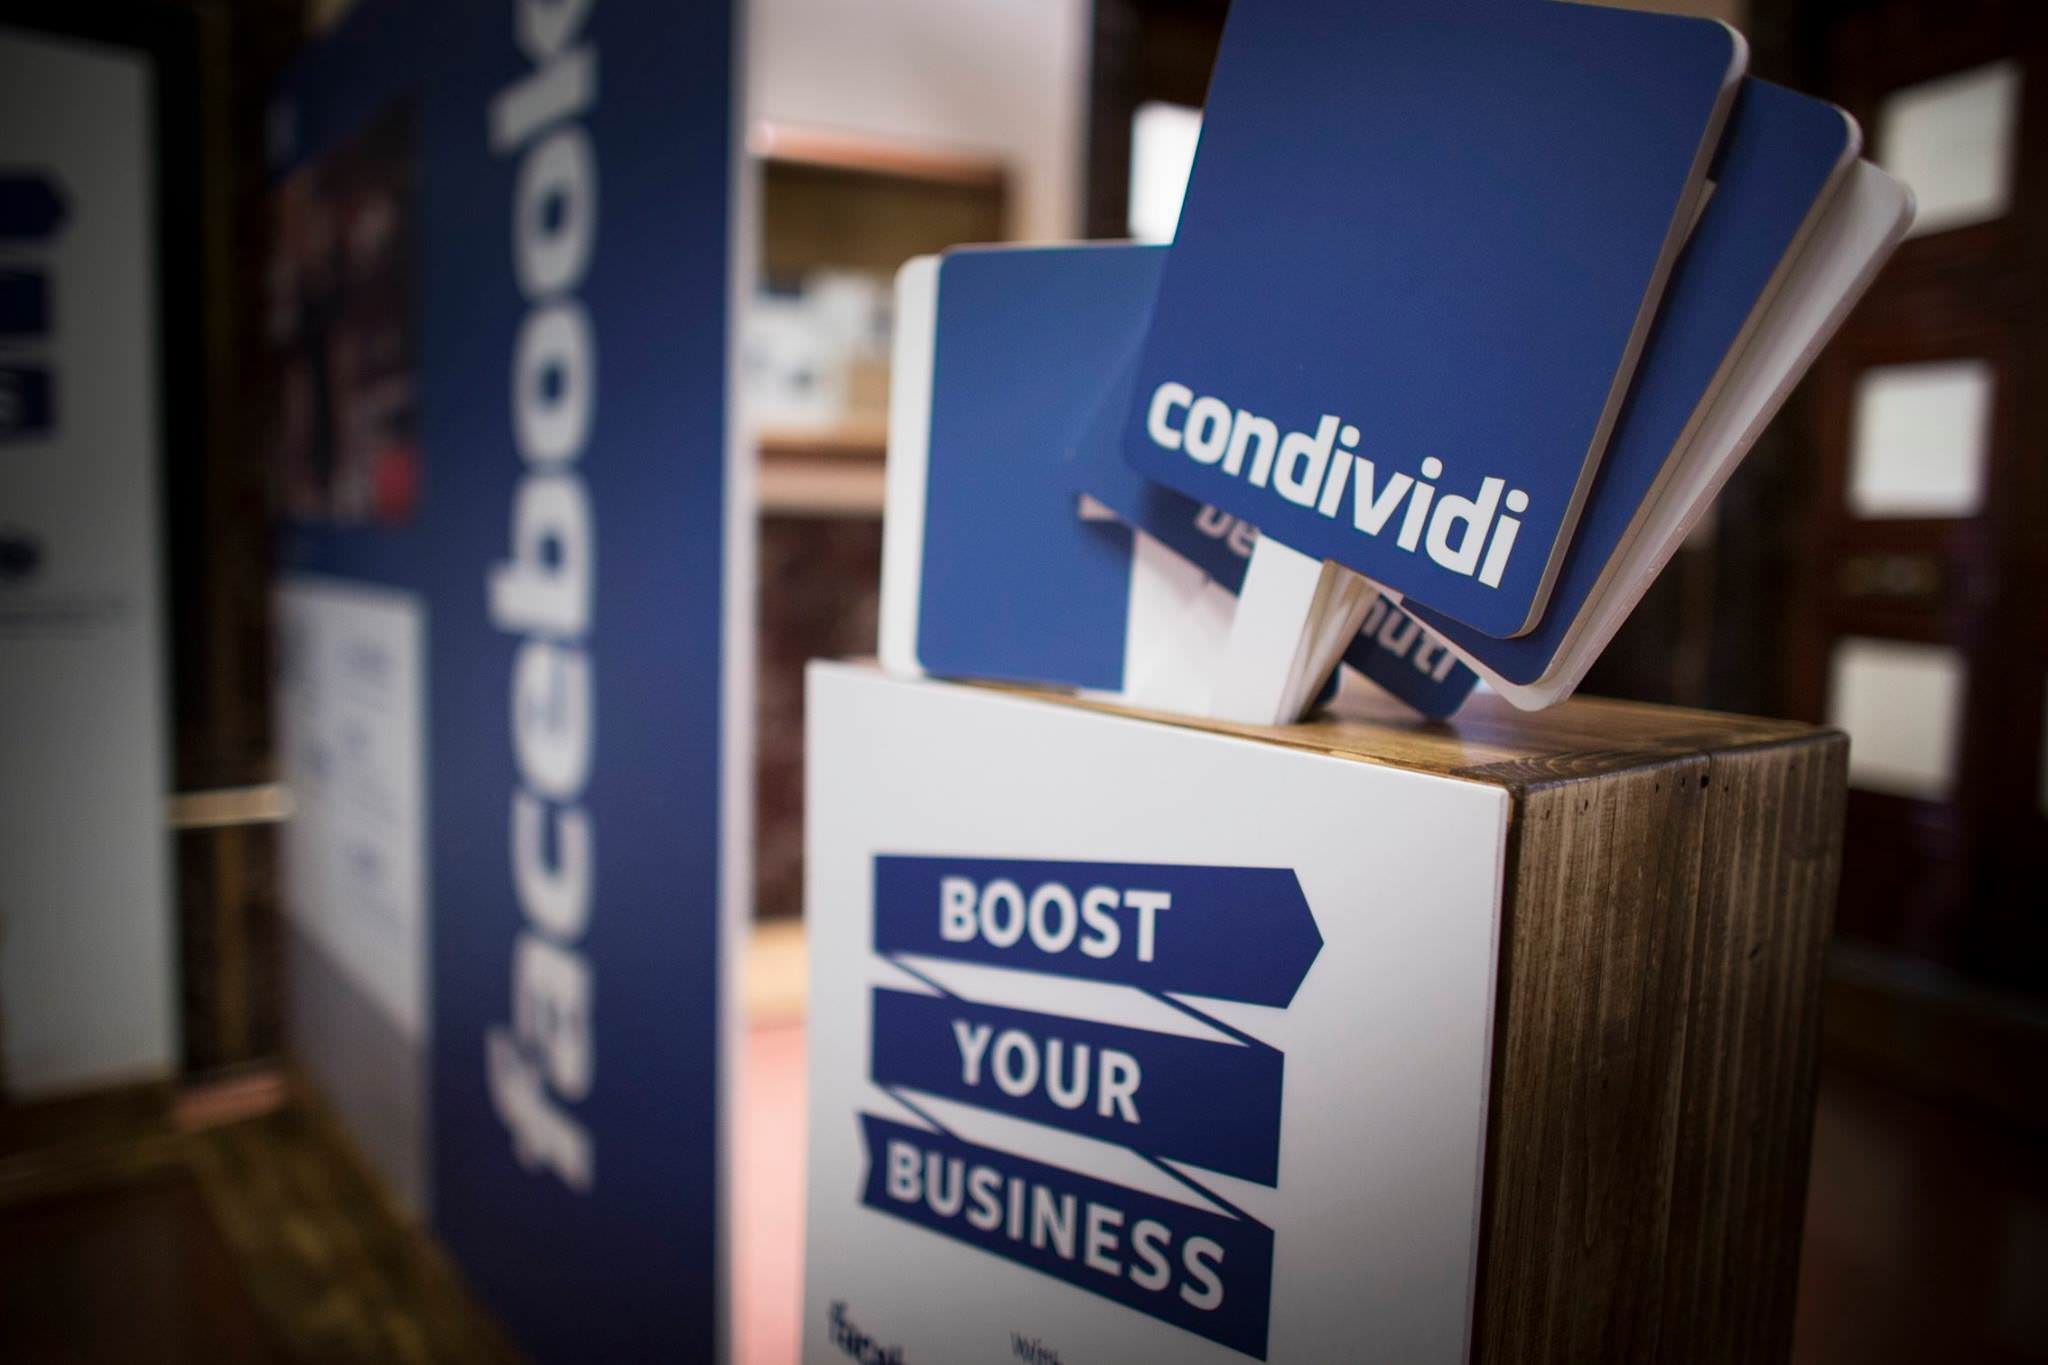 facebook-boost-your-business-gruppo-peroni-eventi-02